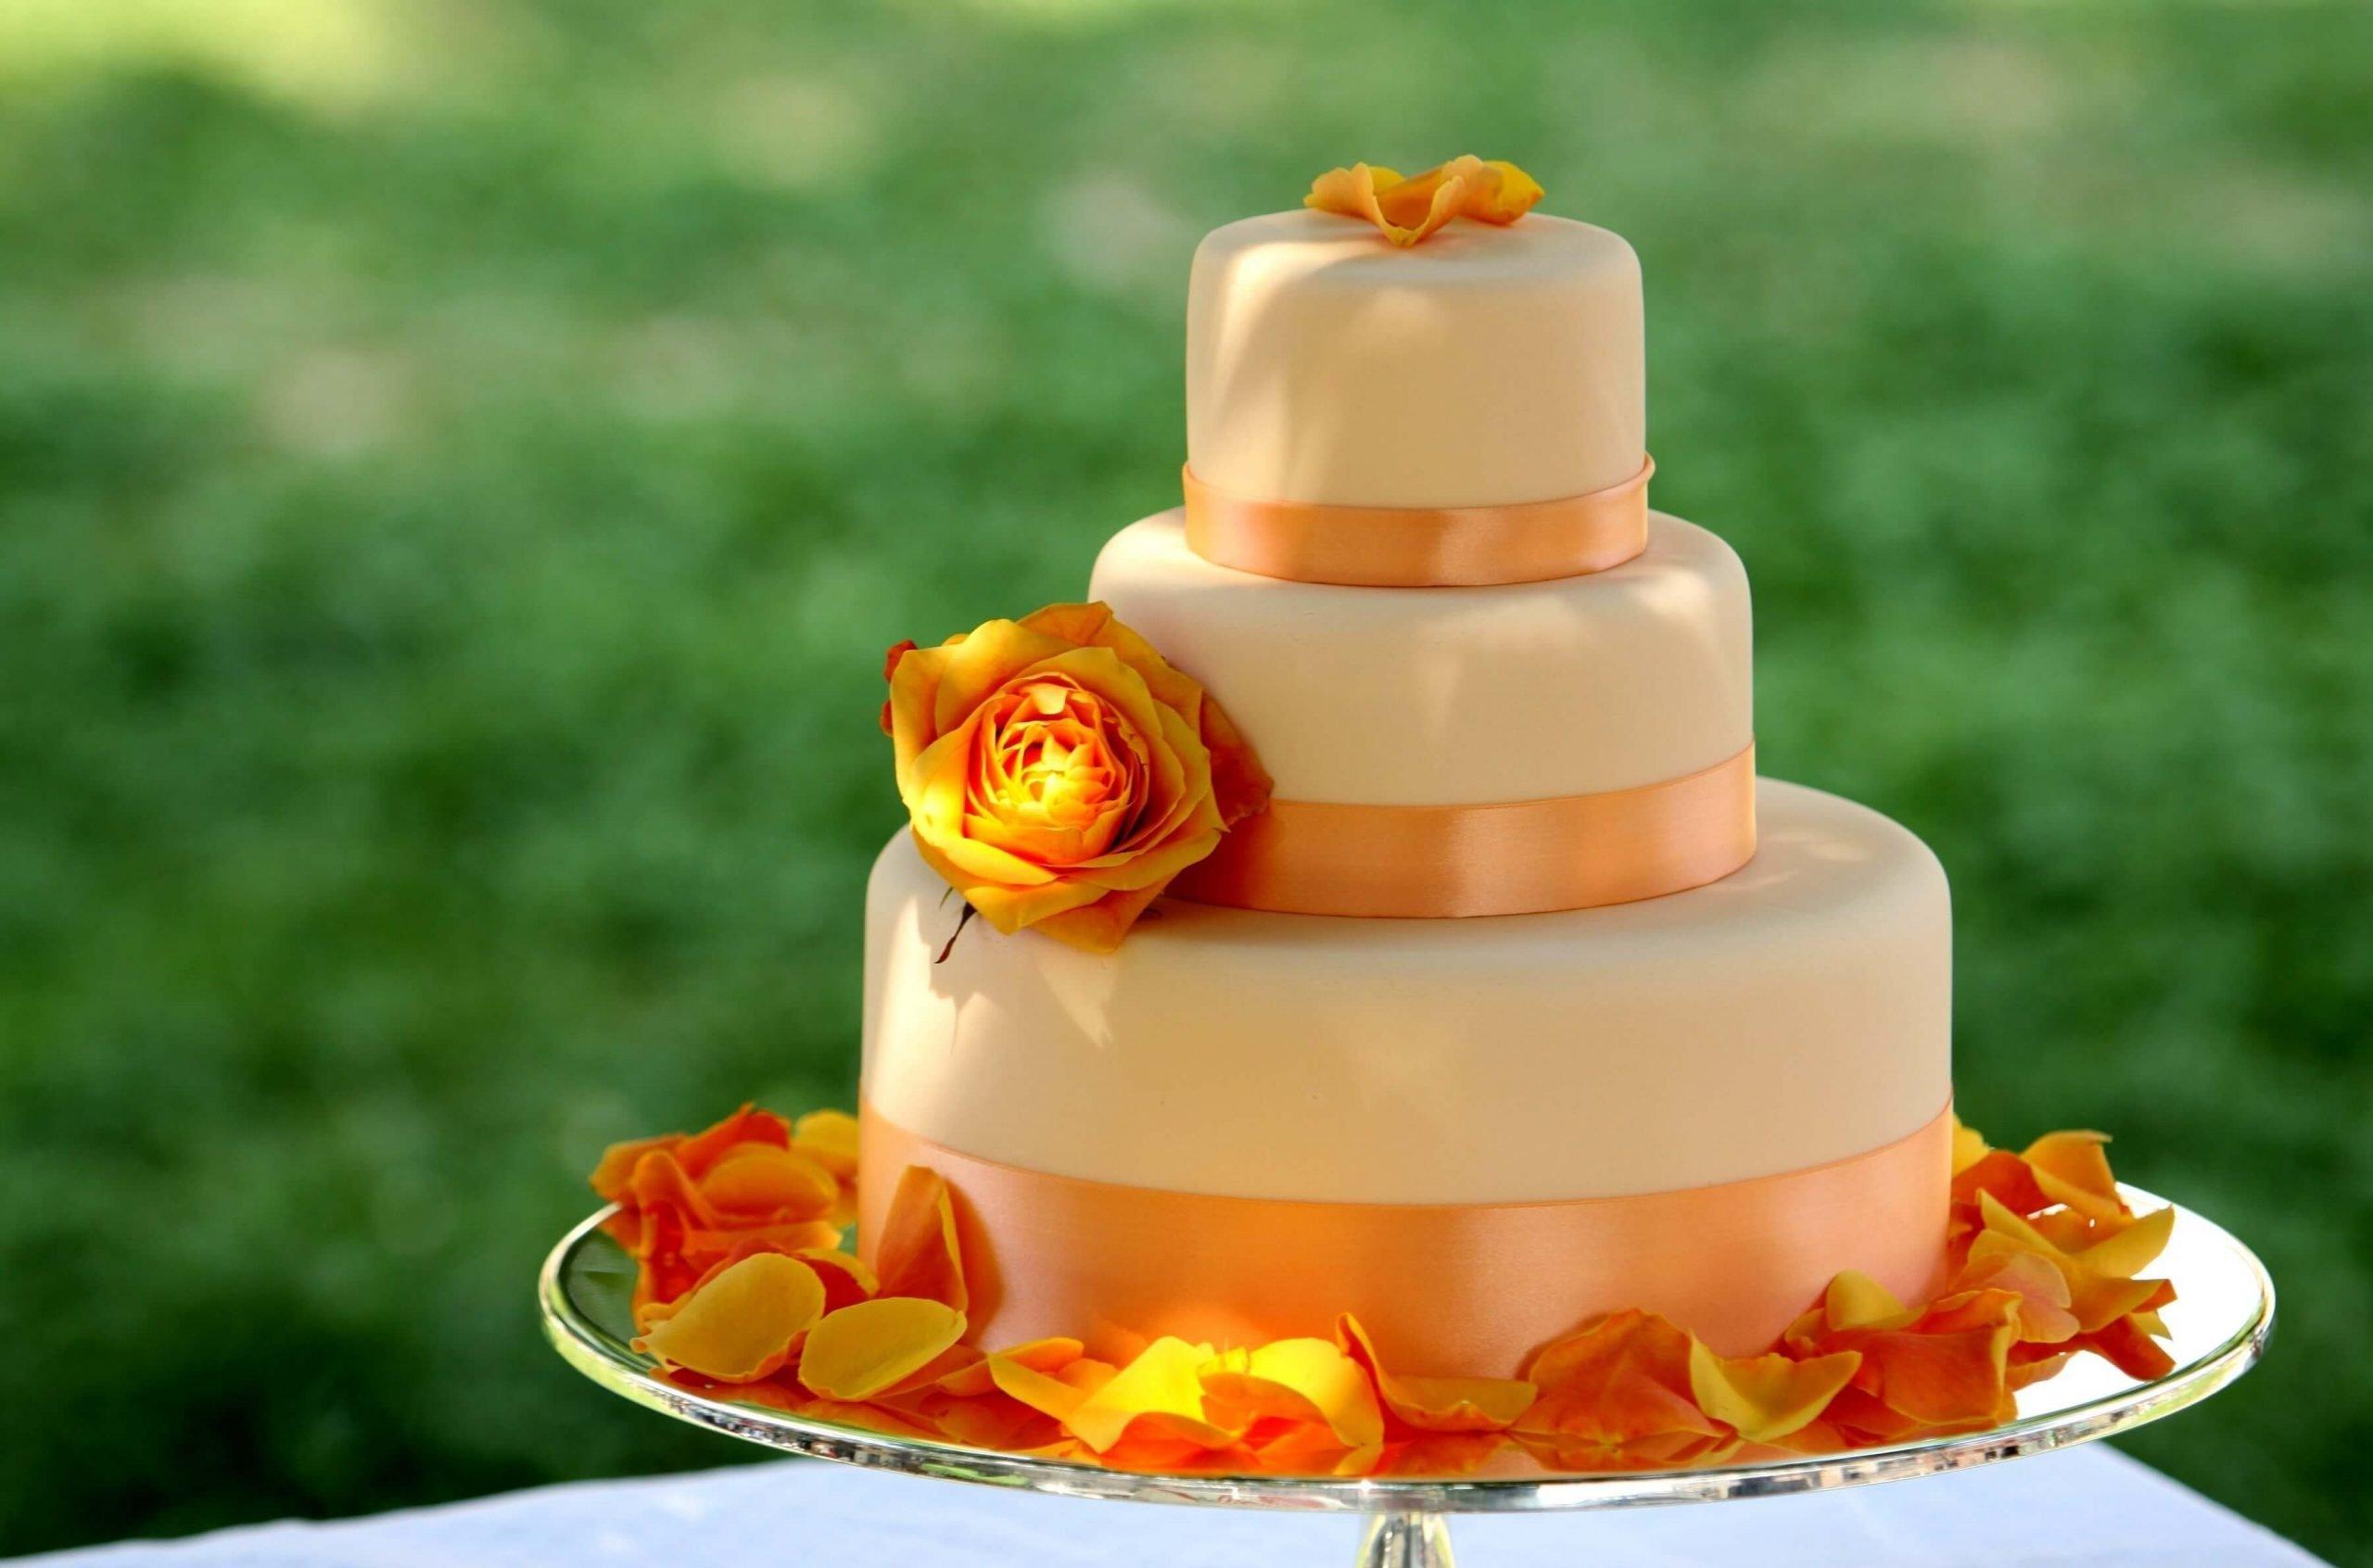 Orange 3-tiered cake